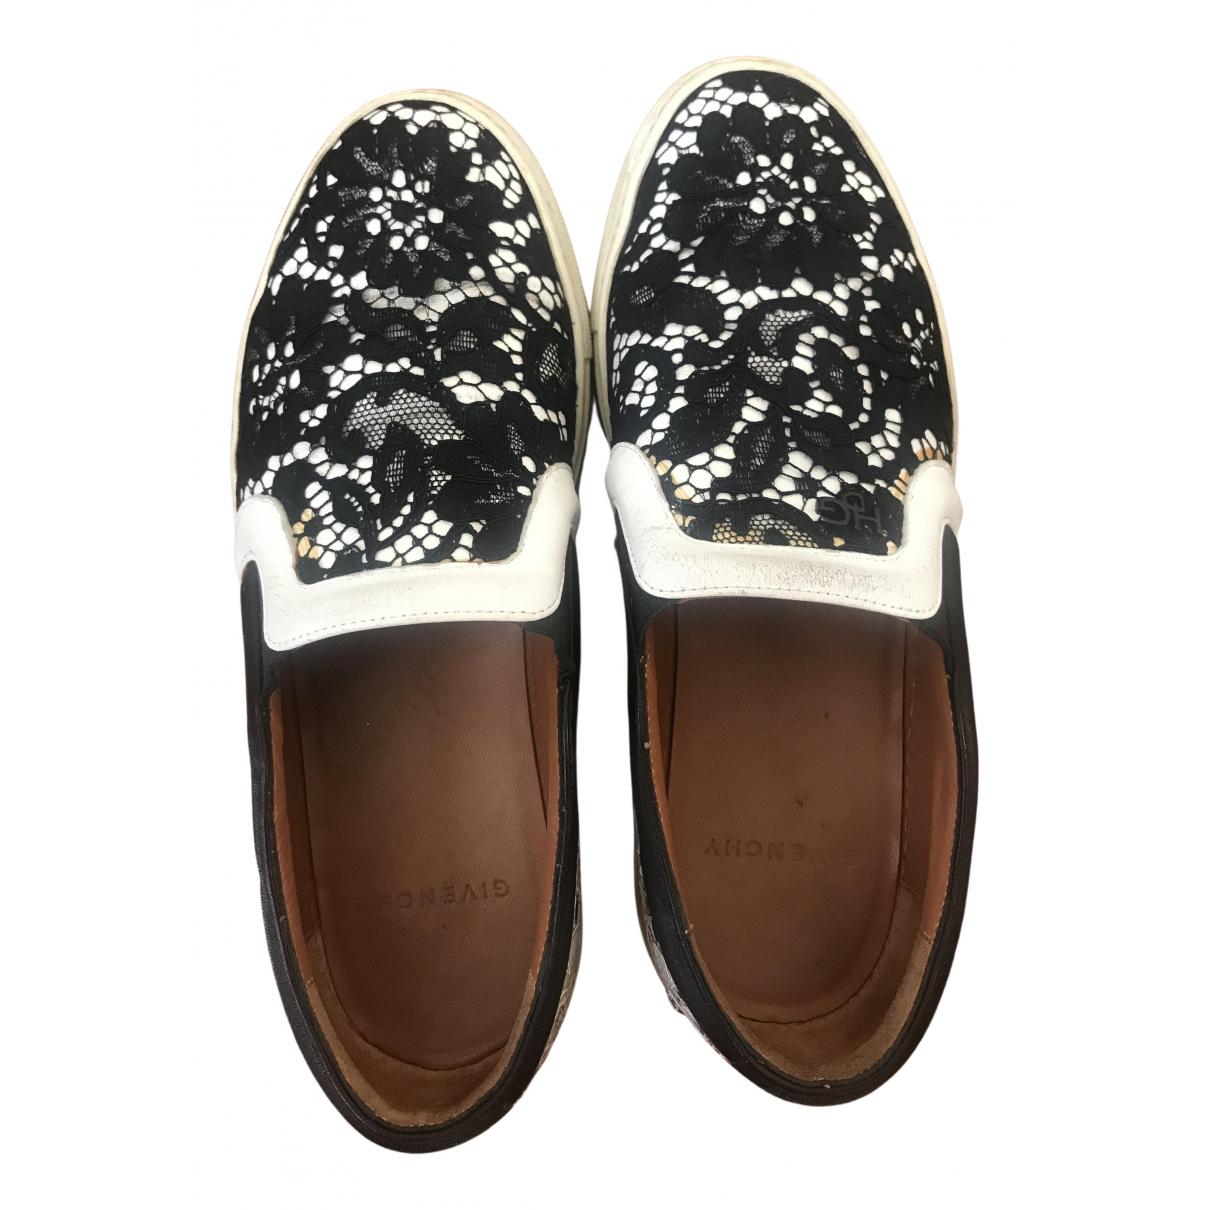 Givenchy \N Sneakers in  Schwarz Leinen